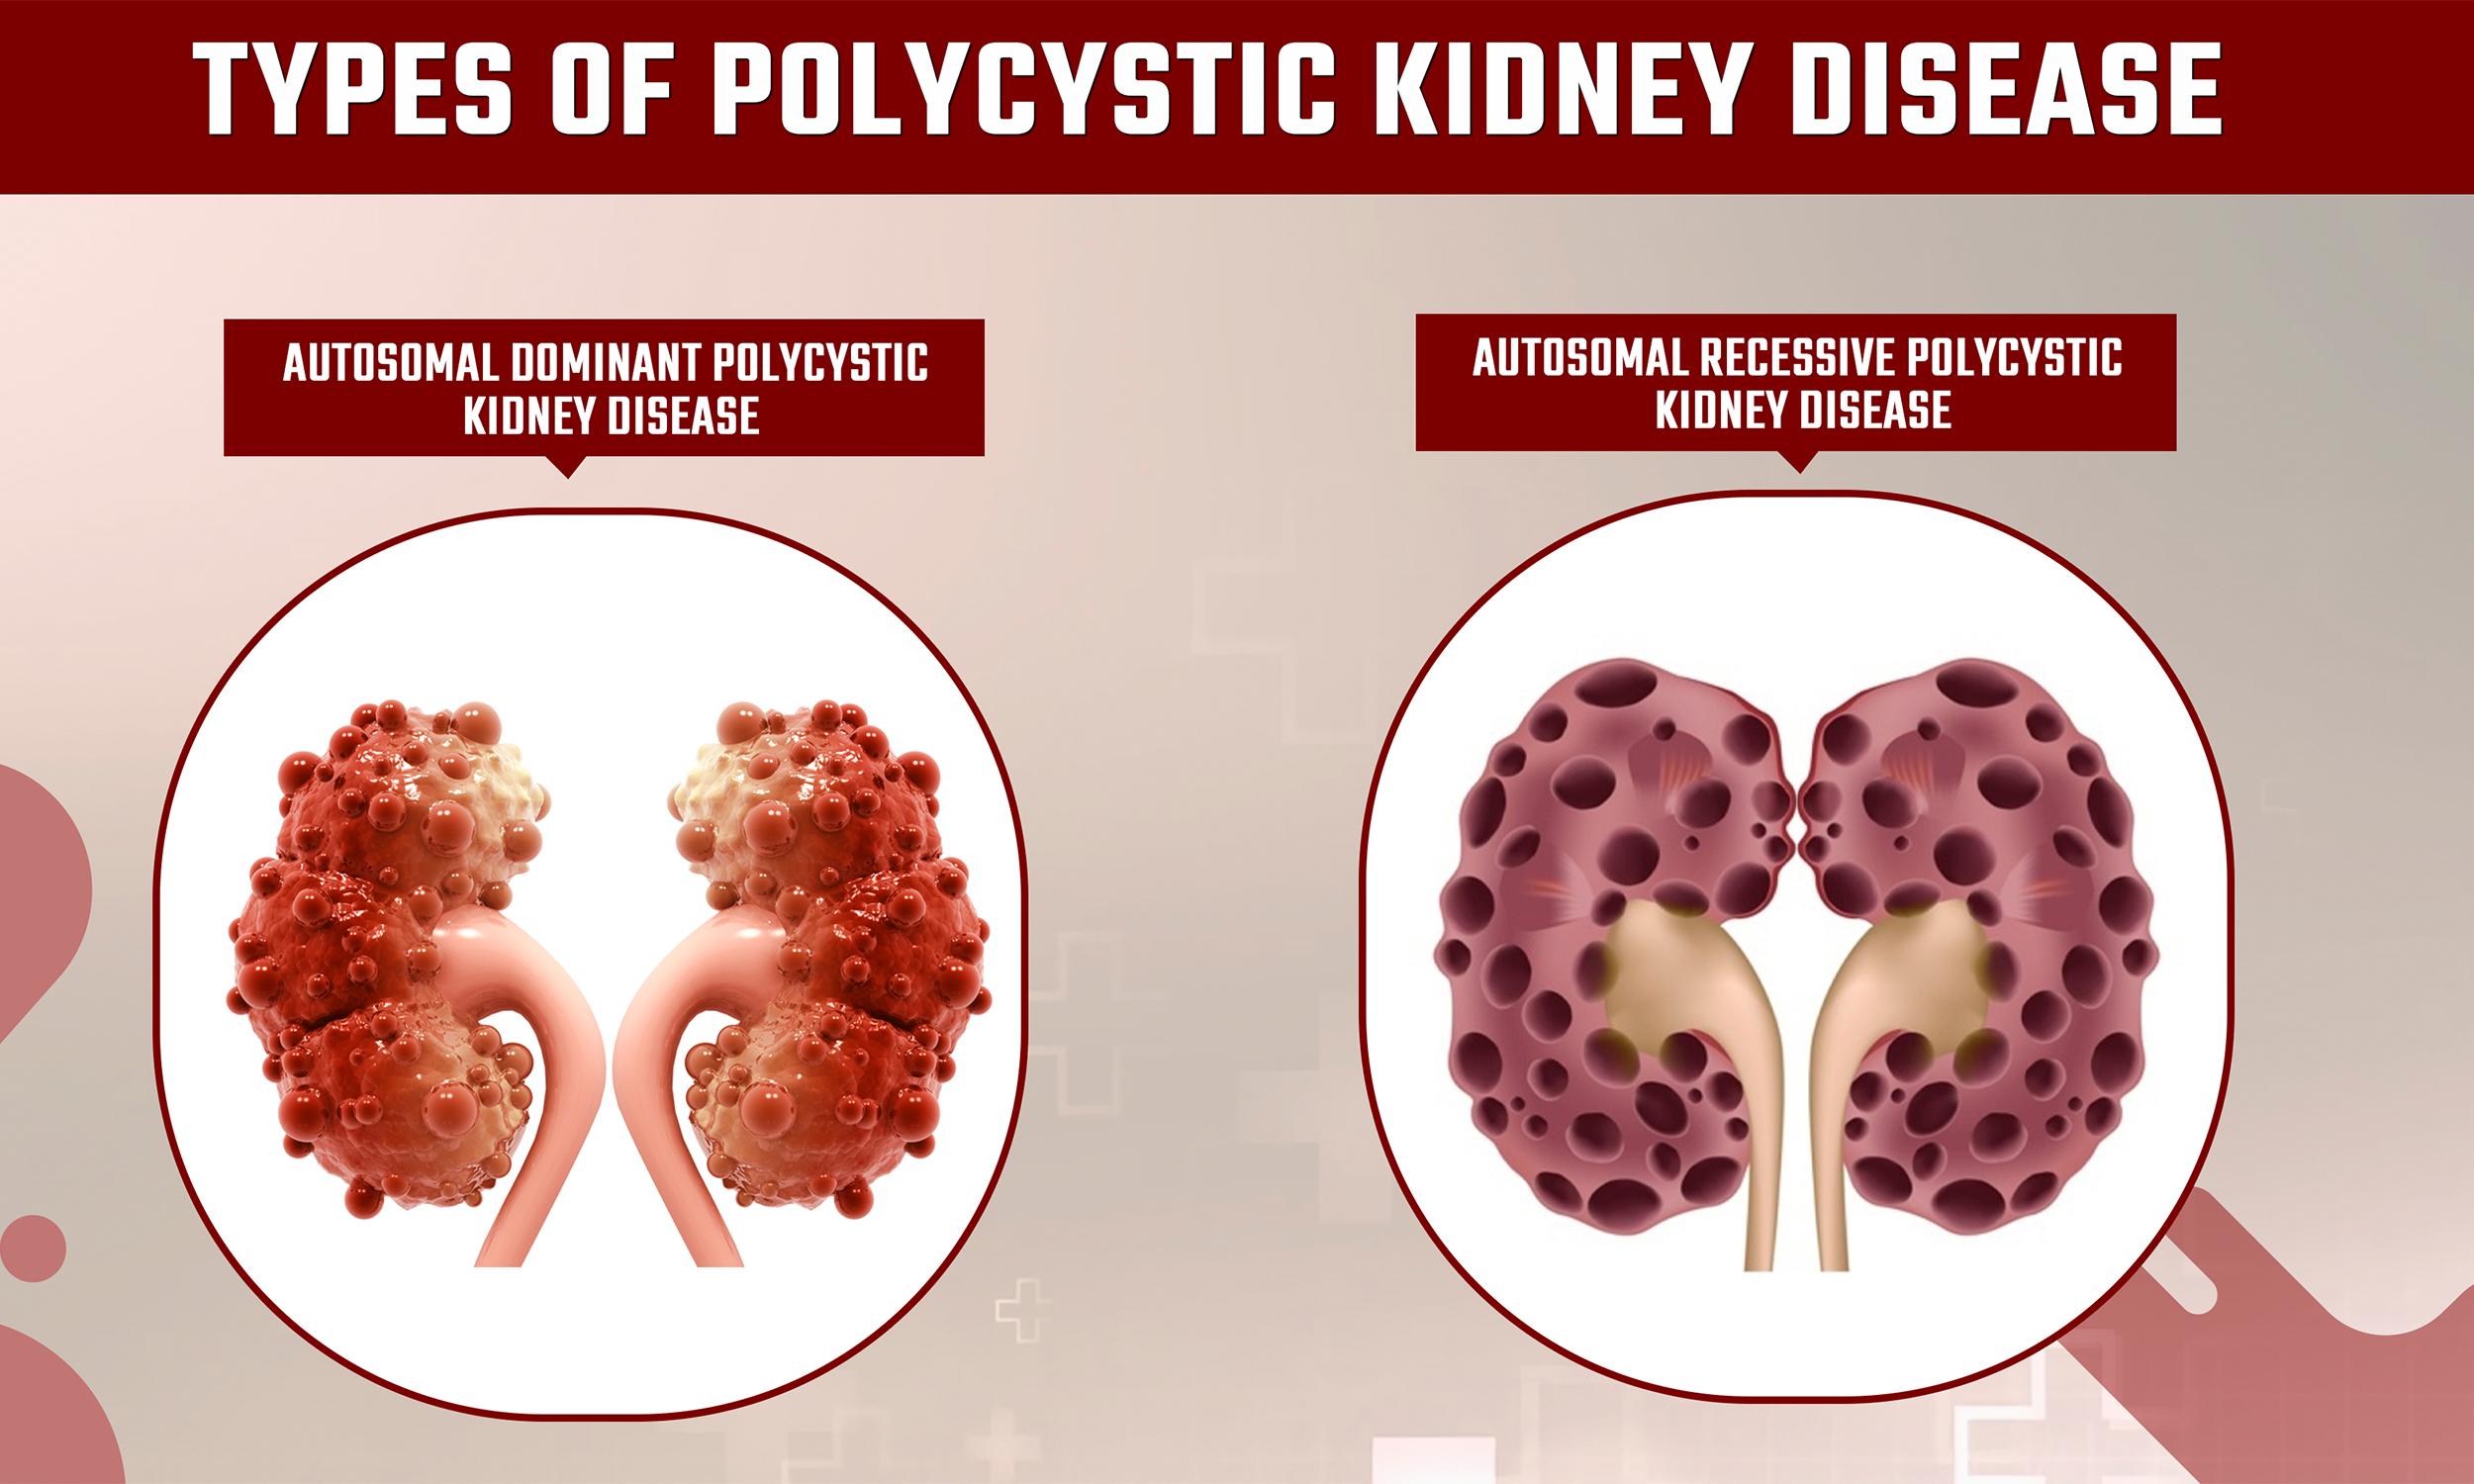 PolycysticKidneyDiseaseTreatment_sriaas.com